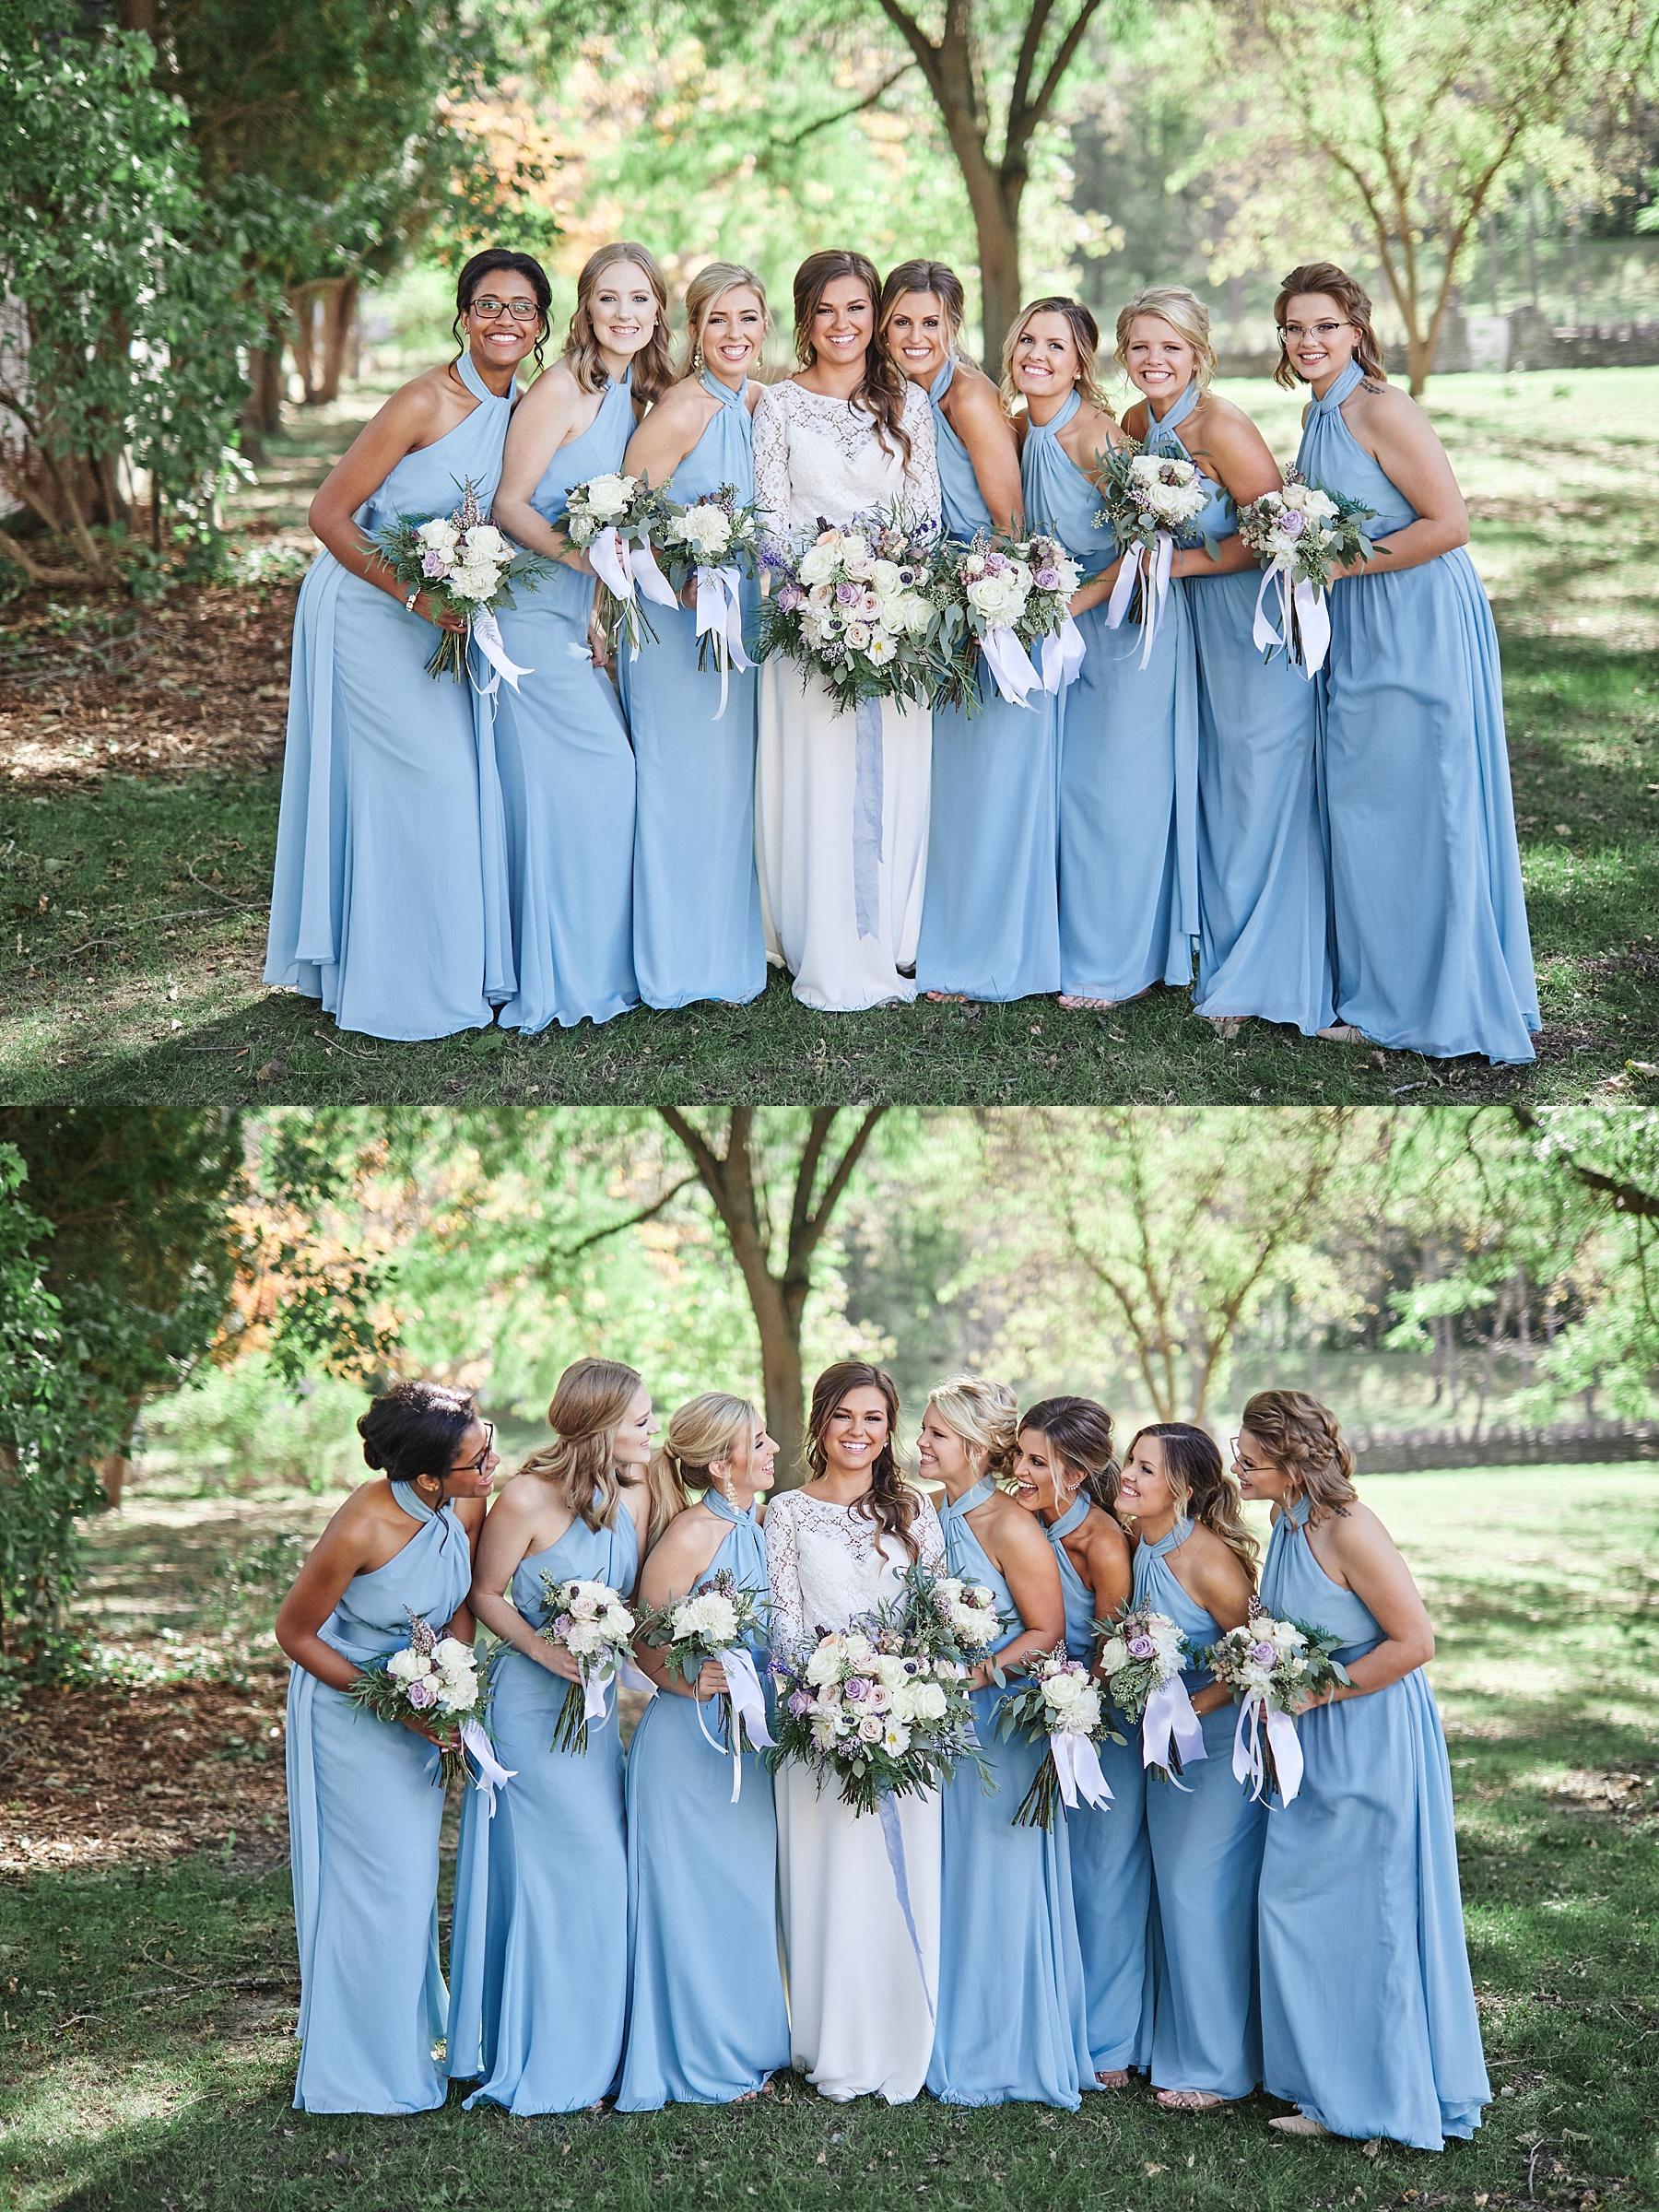 Maywood-Stone-Barn-Wedding-Rochester-Minnesota-Perry-James-Photo_0610.jpg